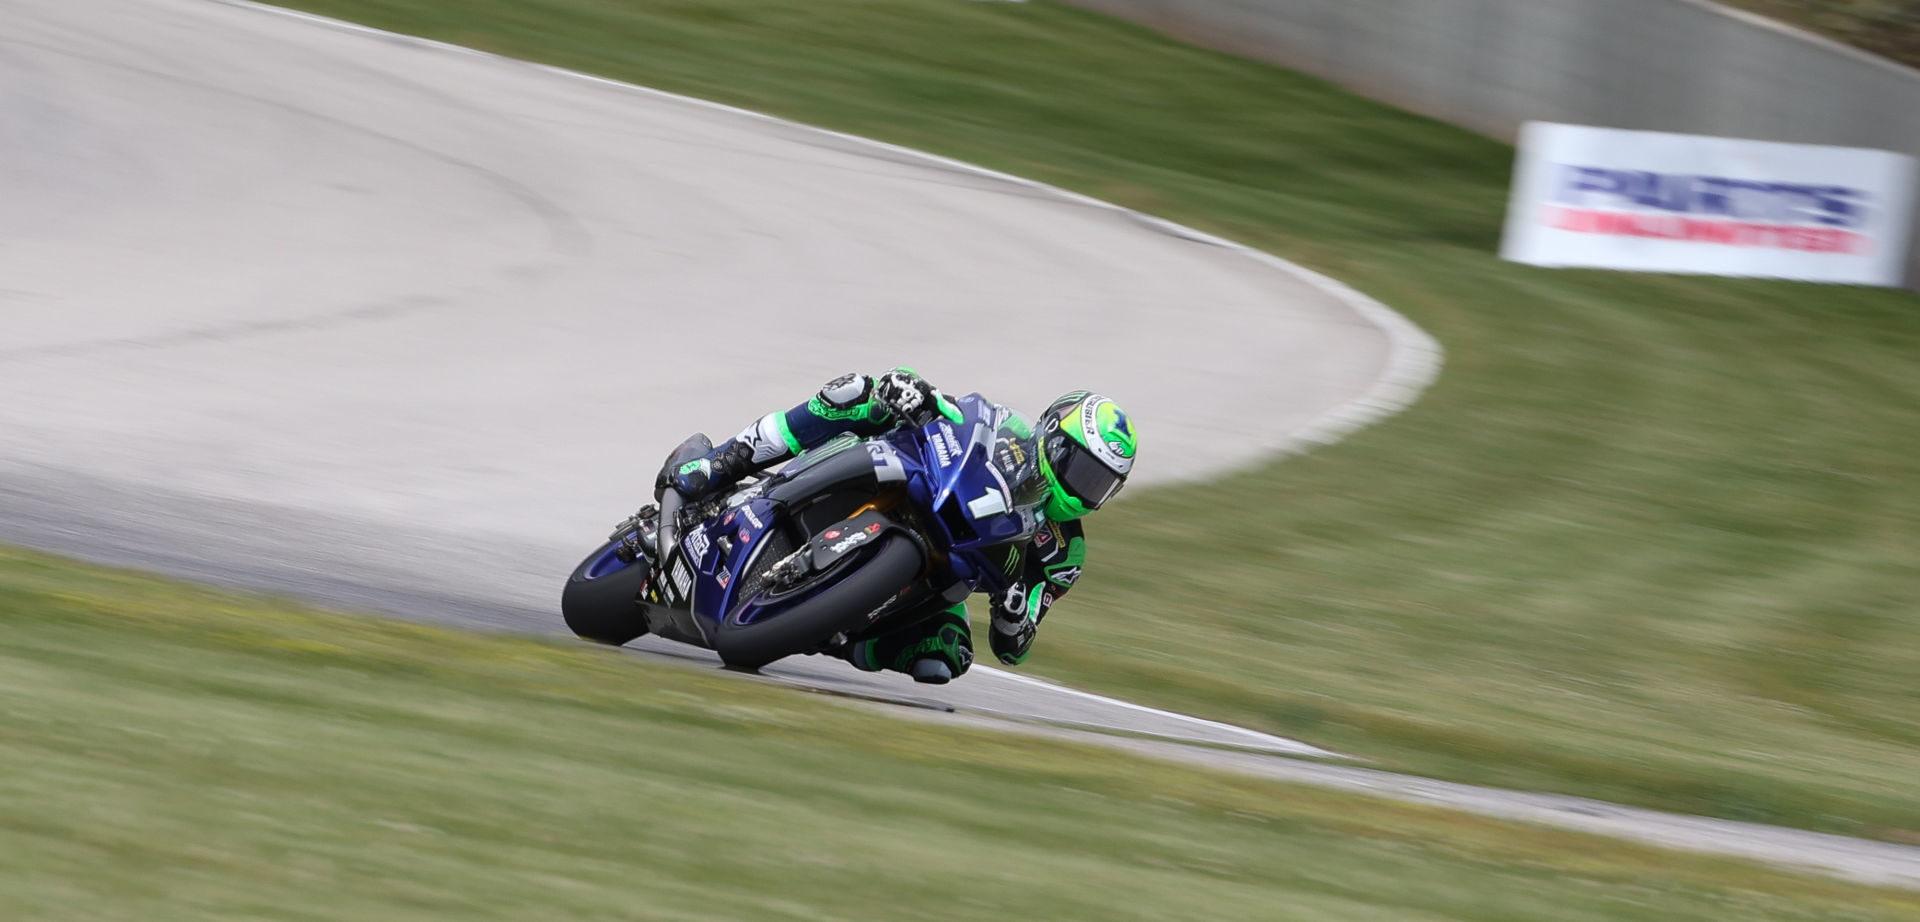 Cameron Beaubier (1). Photo by Brian J. Nelson, courtesy MotoAmerica.